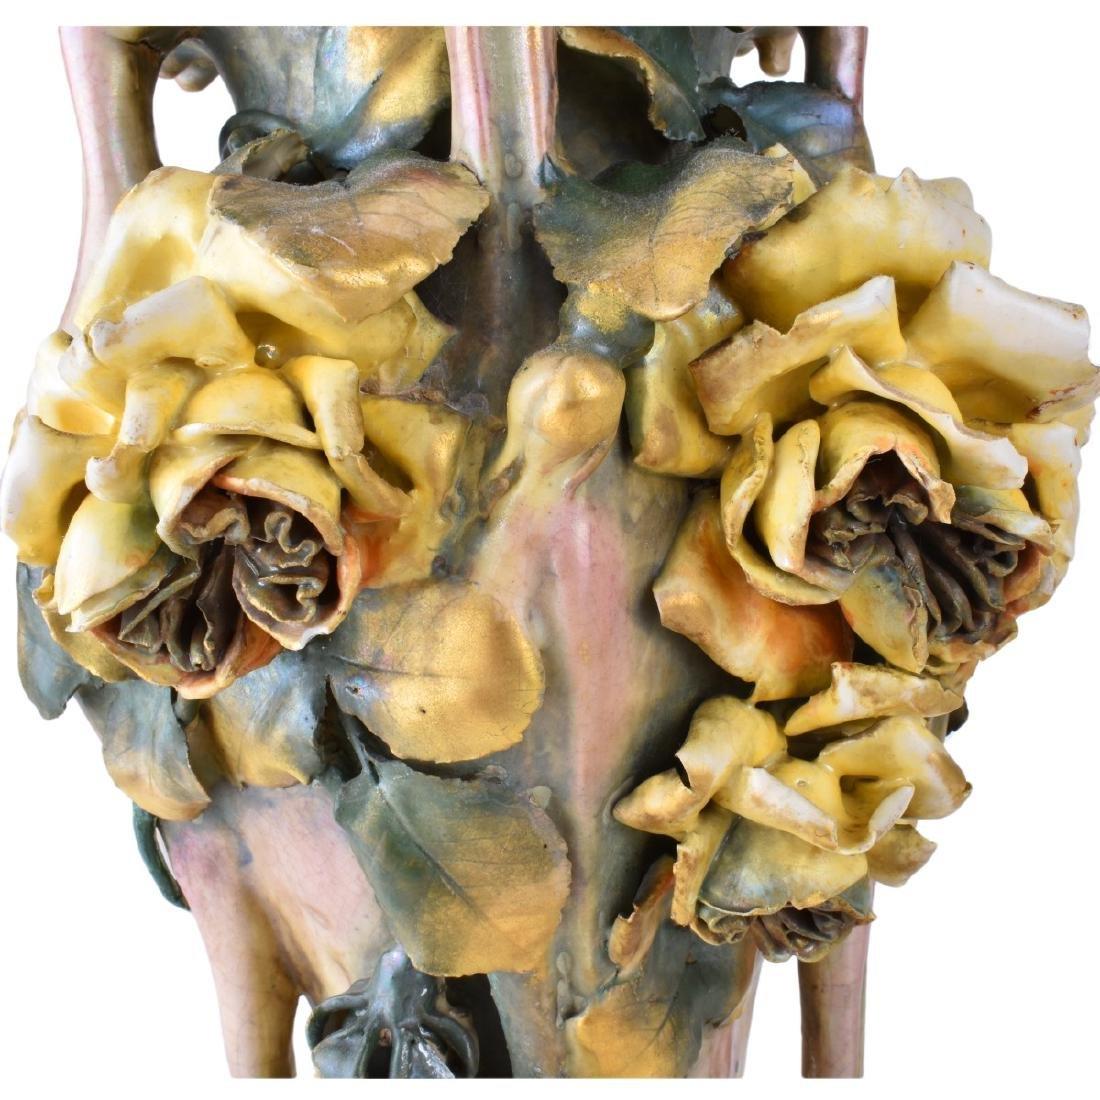 Amphora Edda Pottery Vase with Raised Flowers - 3